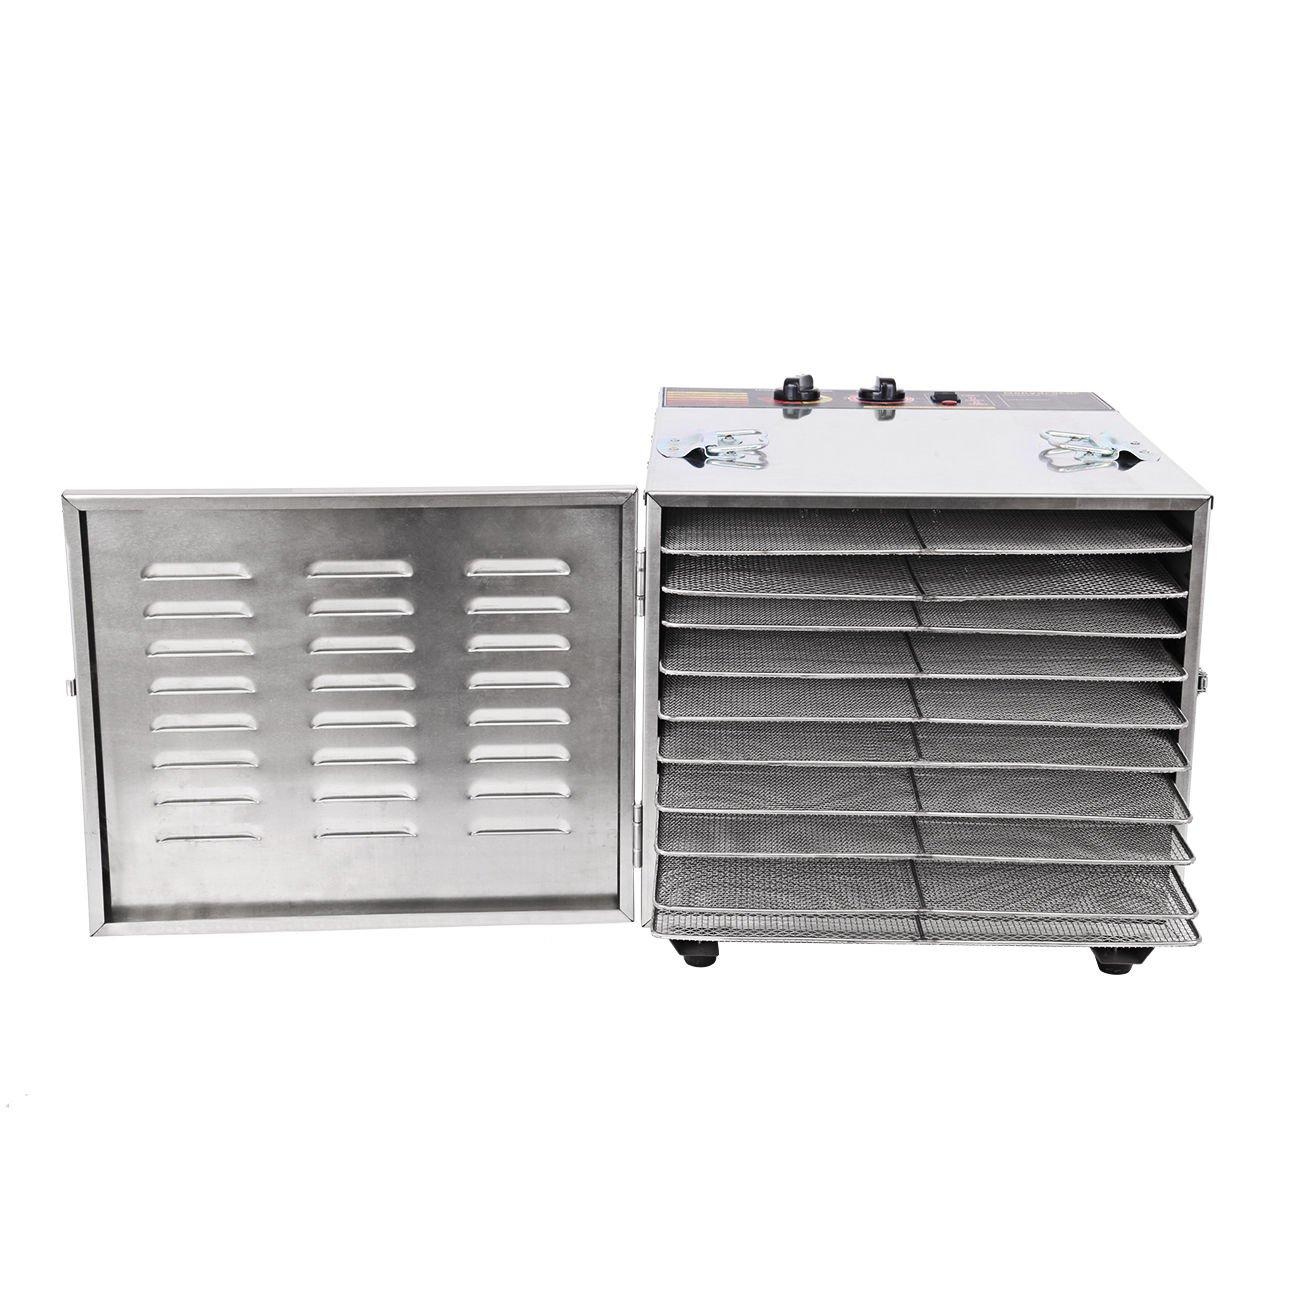 Ridgeyard 1000W Dehydrator Commercial Grade Stainless Steel Digital Food Dehydrator Jerky Dryer 10 Trays 158 Degree Fahrenheit with 15 Hour Timer by Ridgeyard (Image #4)